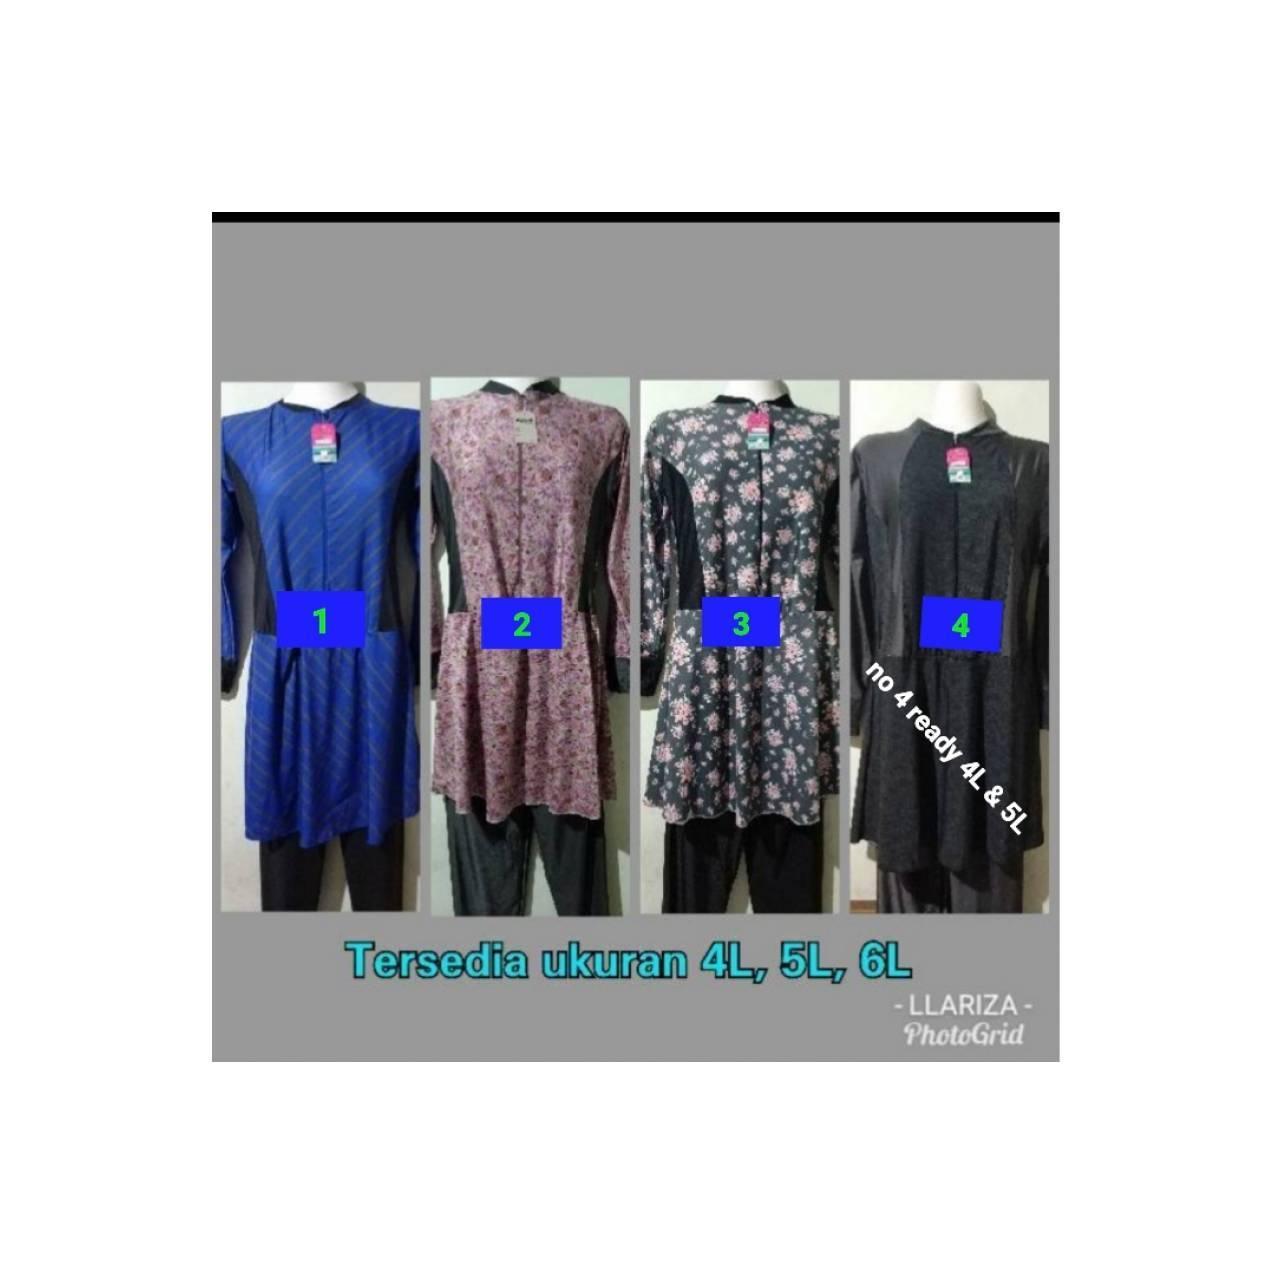 Jual baju renang muslim dewasa ukuran jumbo XXXL XXXXL